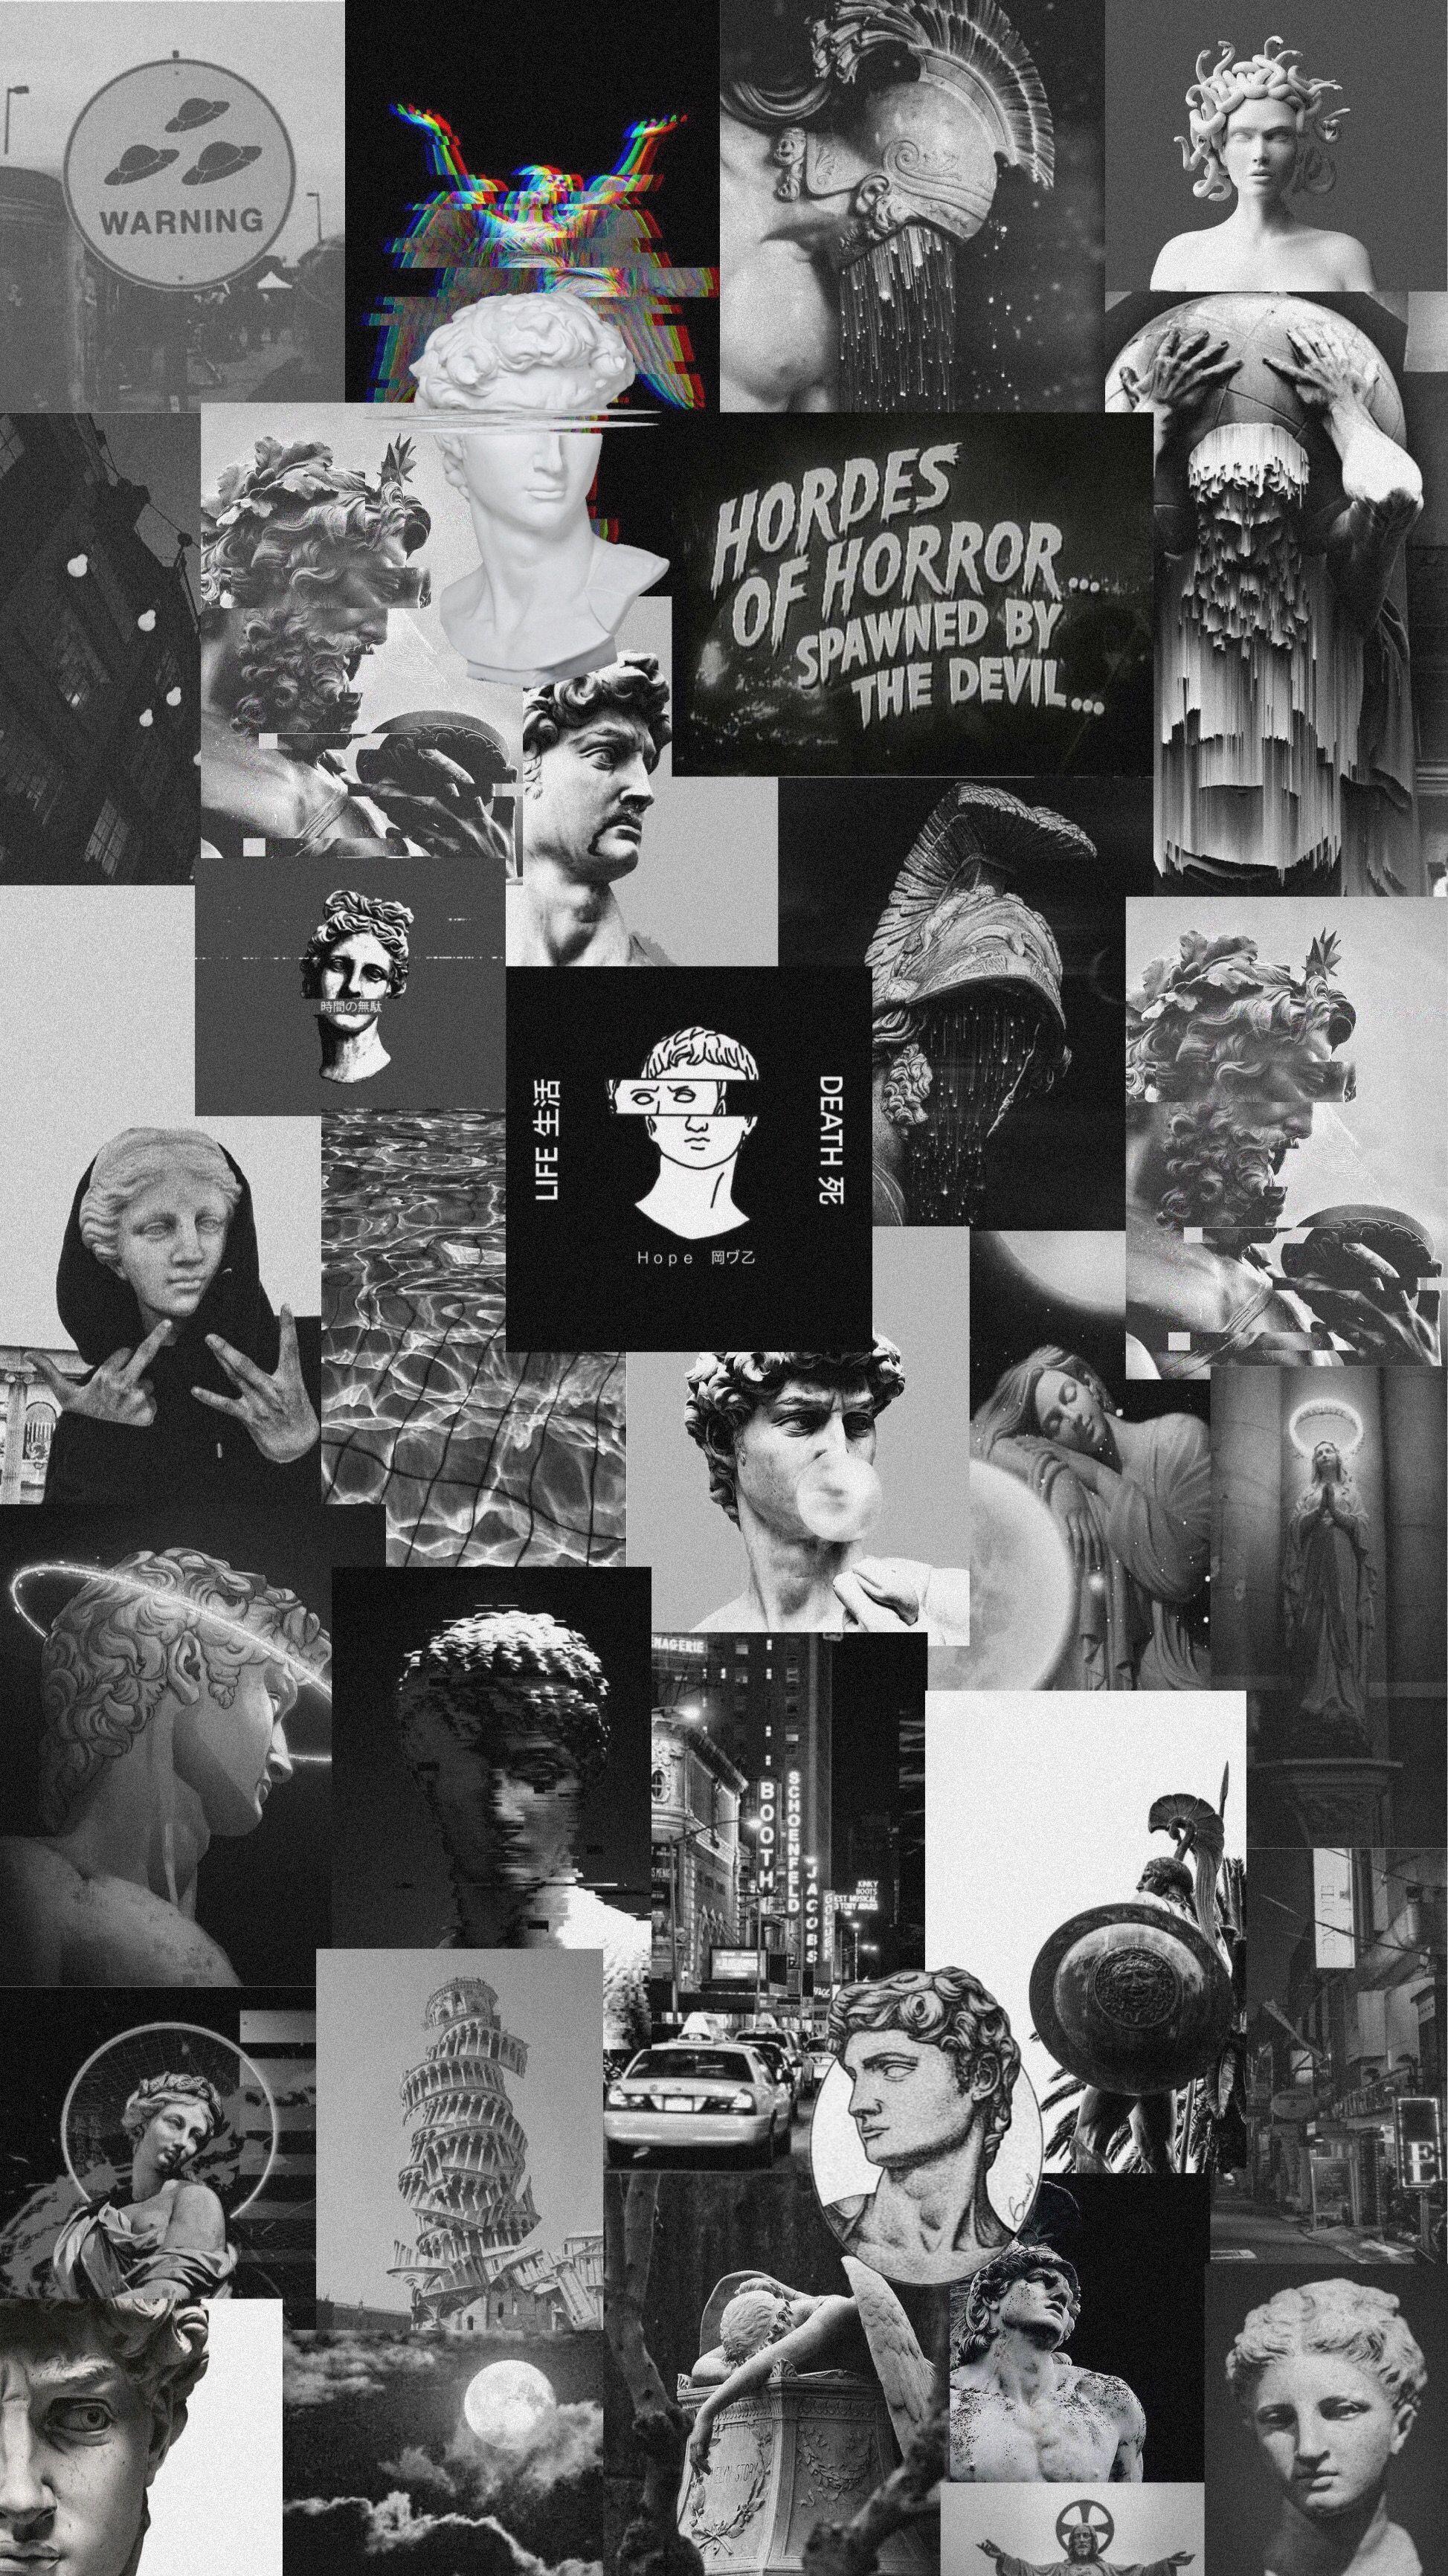 Black Collage Wallpaper : black, collage, wallpaper, Black, White, Collage, Wallpapers, Backgrounds, WallpaperAccess